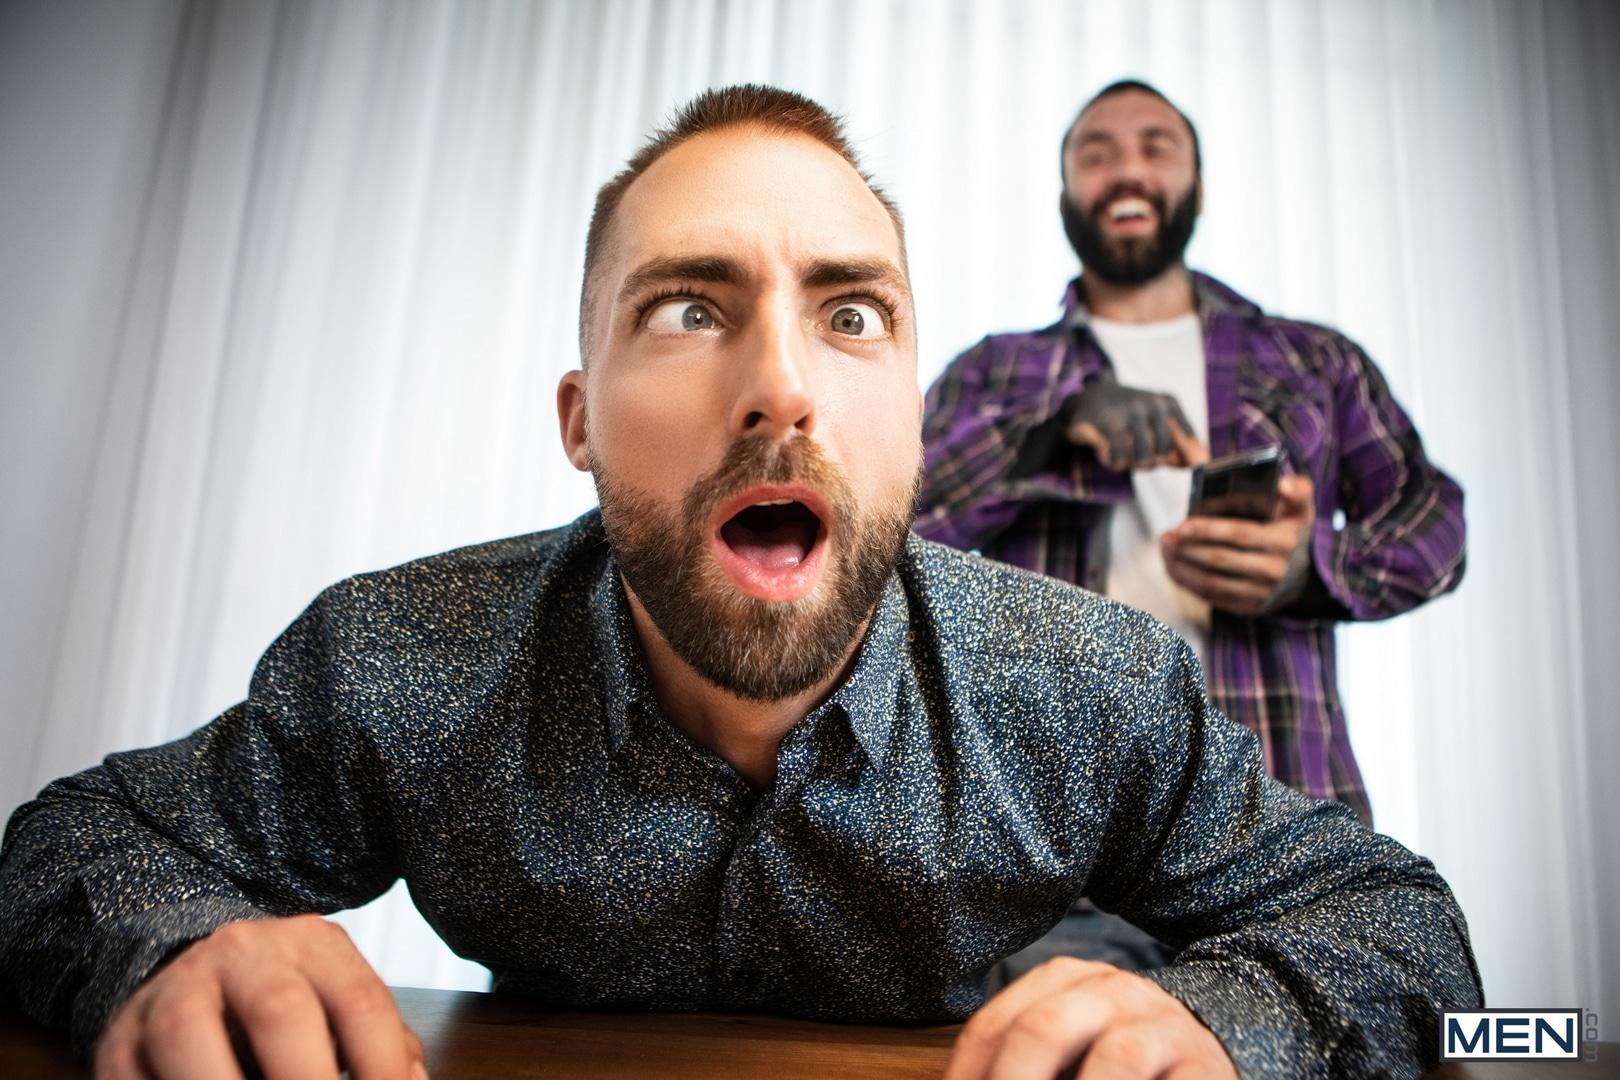 Bearded men gay porn